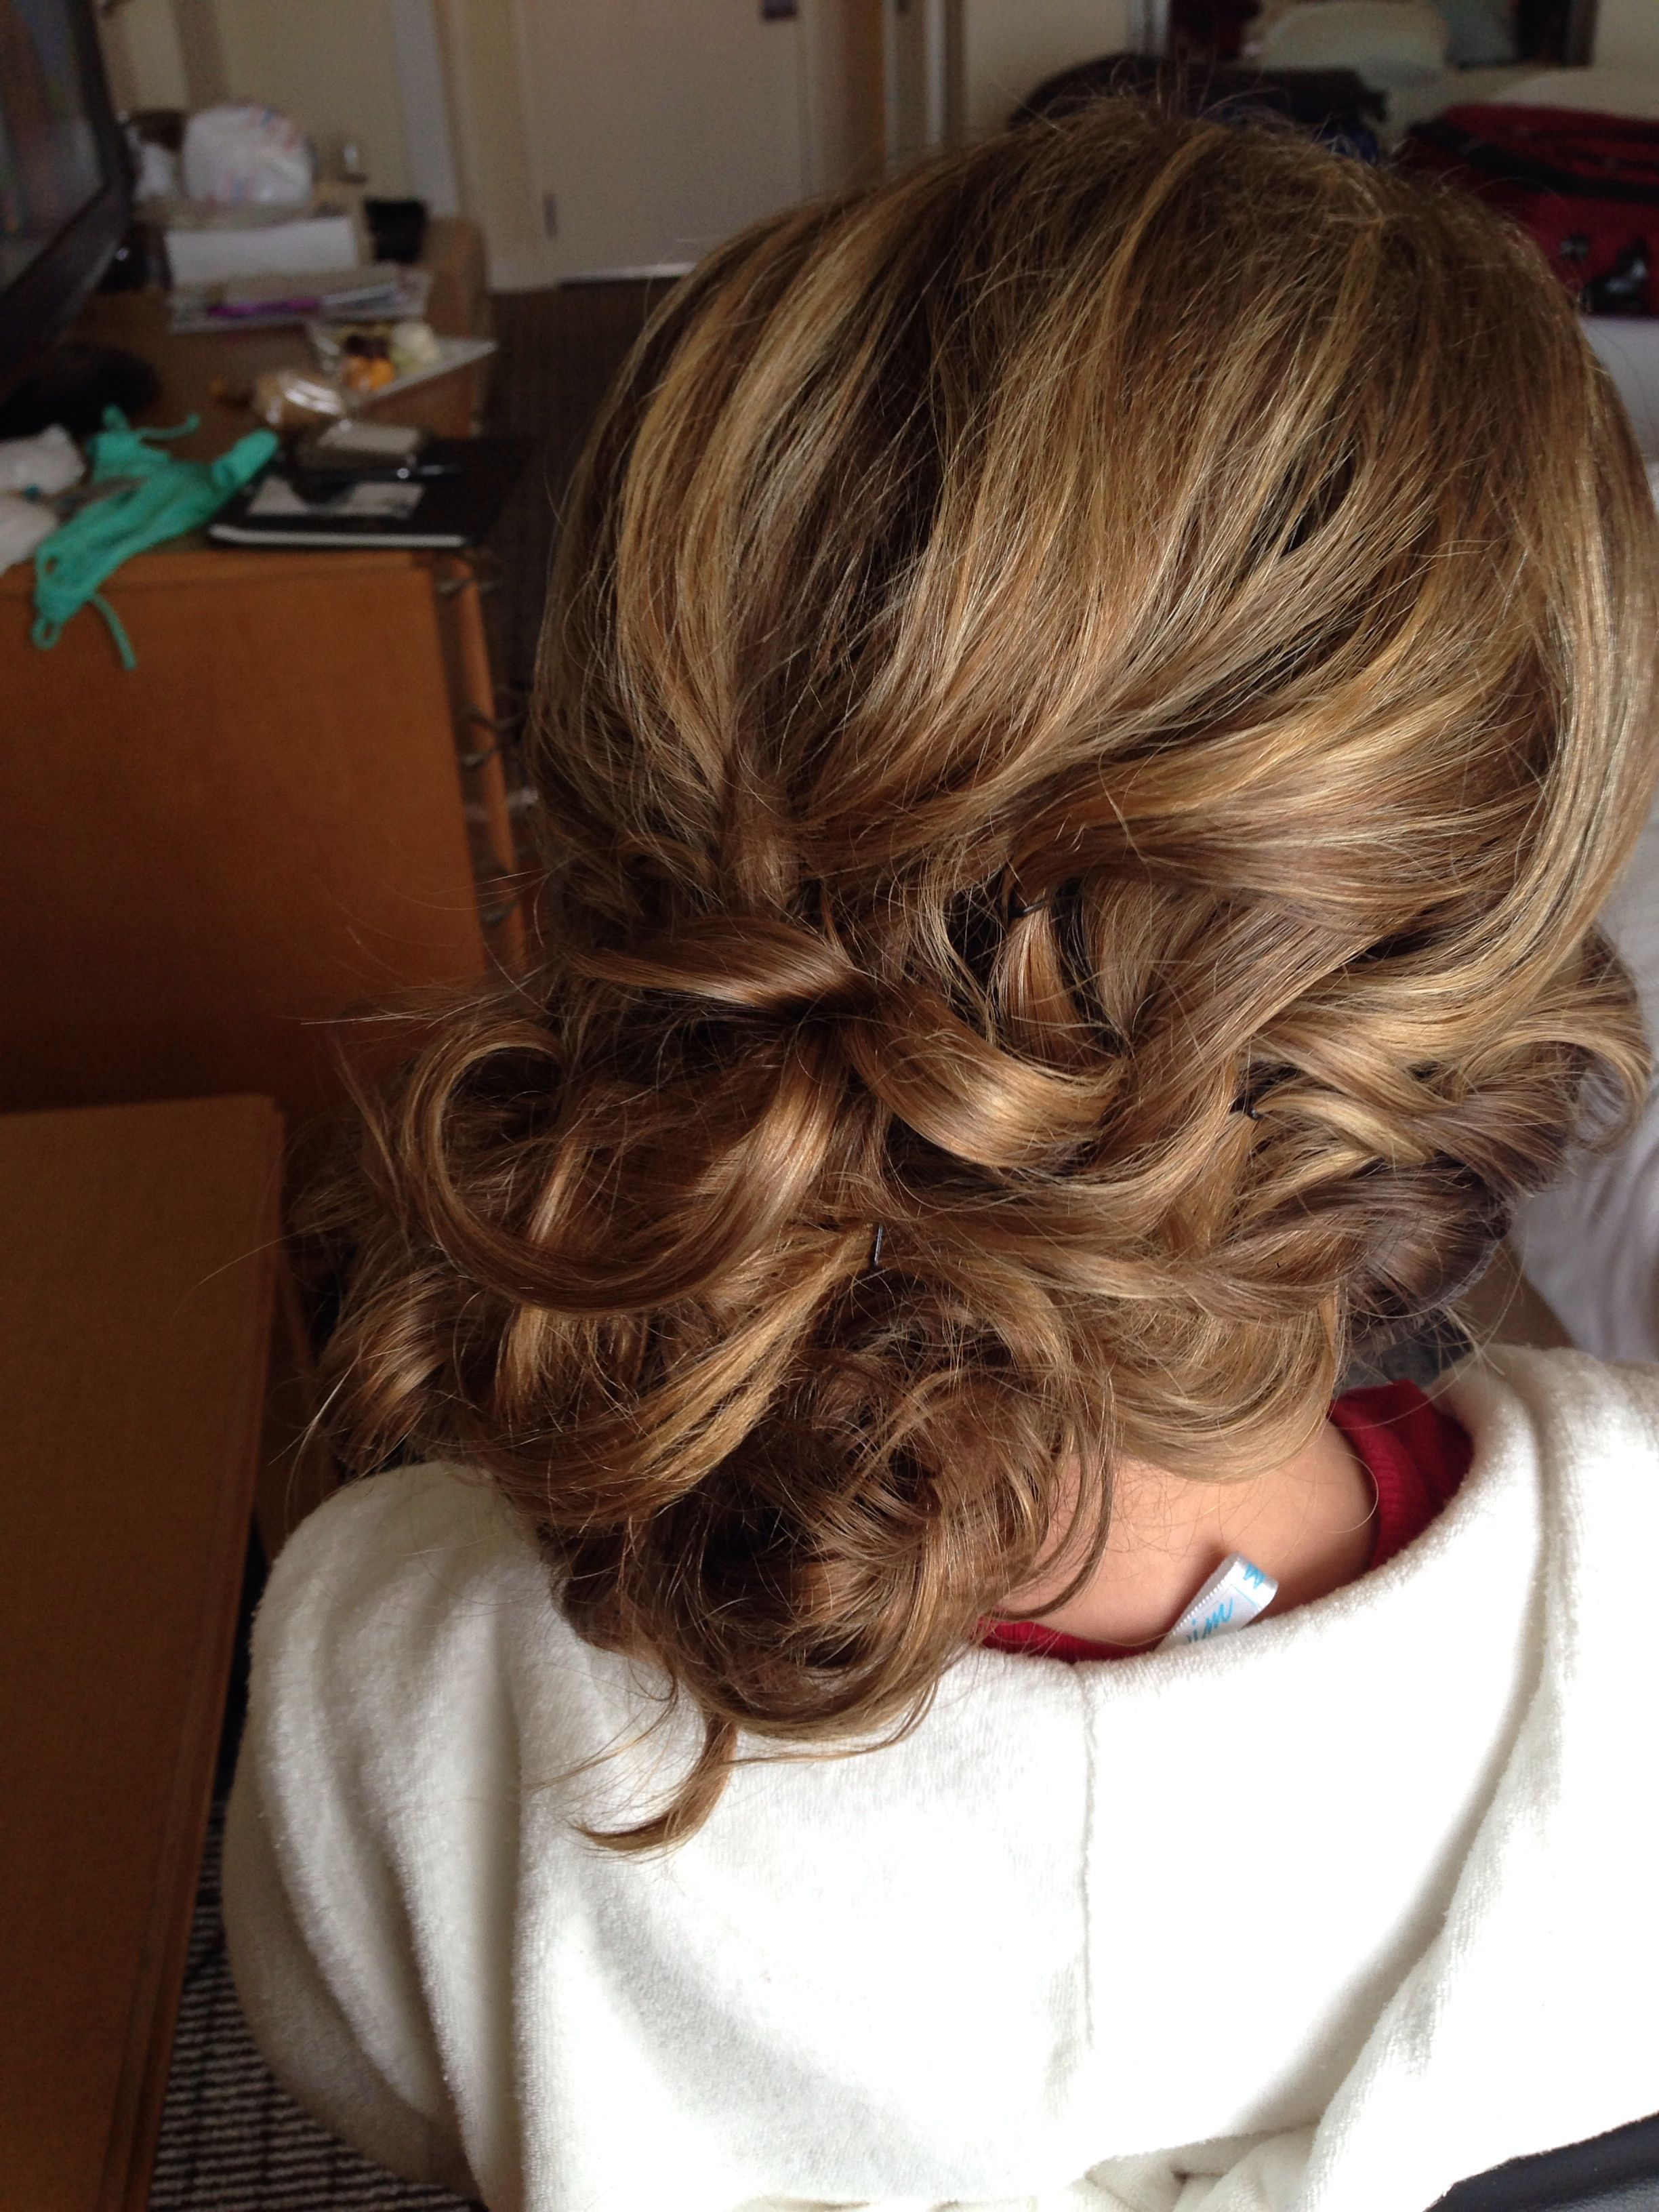 Side Bun Curly Bun Messy Bun Updo Beachy Hair Wedding Hair Bridal Hair Side Swept Updo Pr Side Curls Hairstyles Easy Bun Hairstyles Side Bun Hairstyles